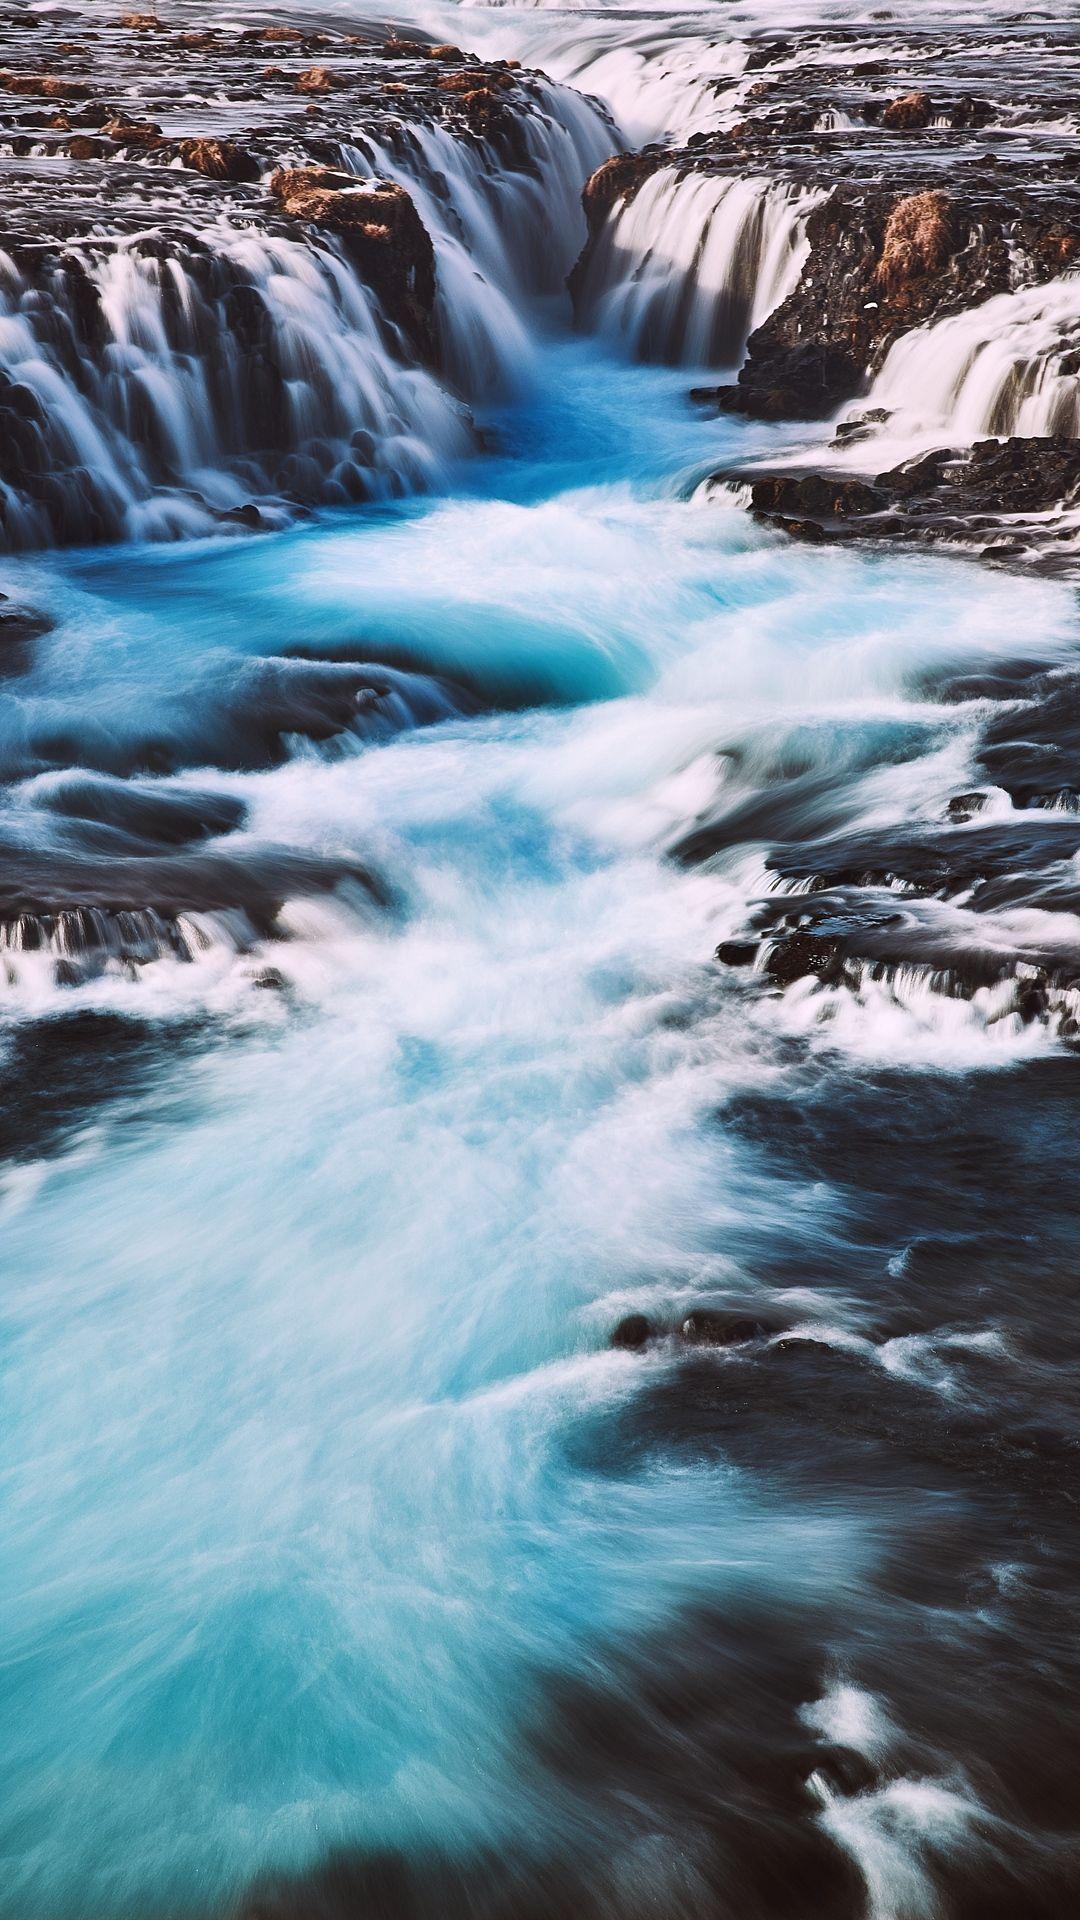 Waterfall 1920 1080